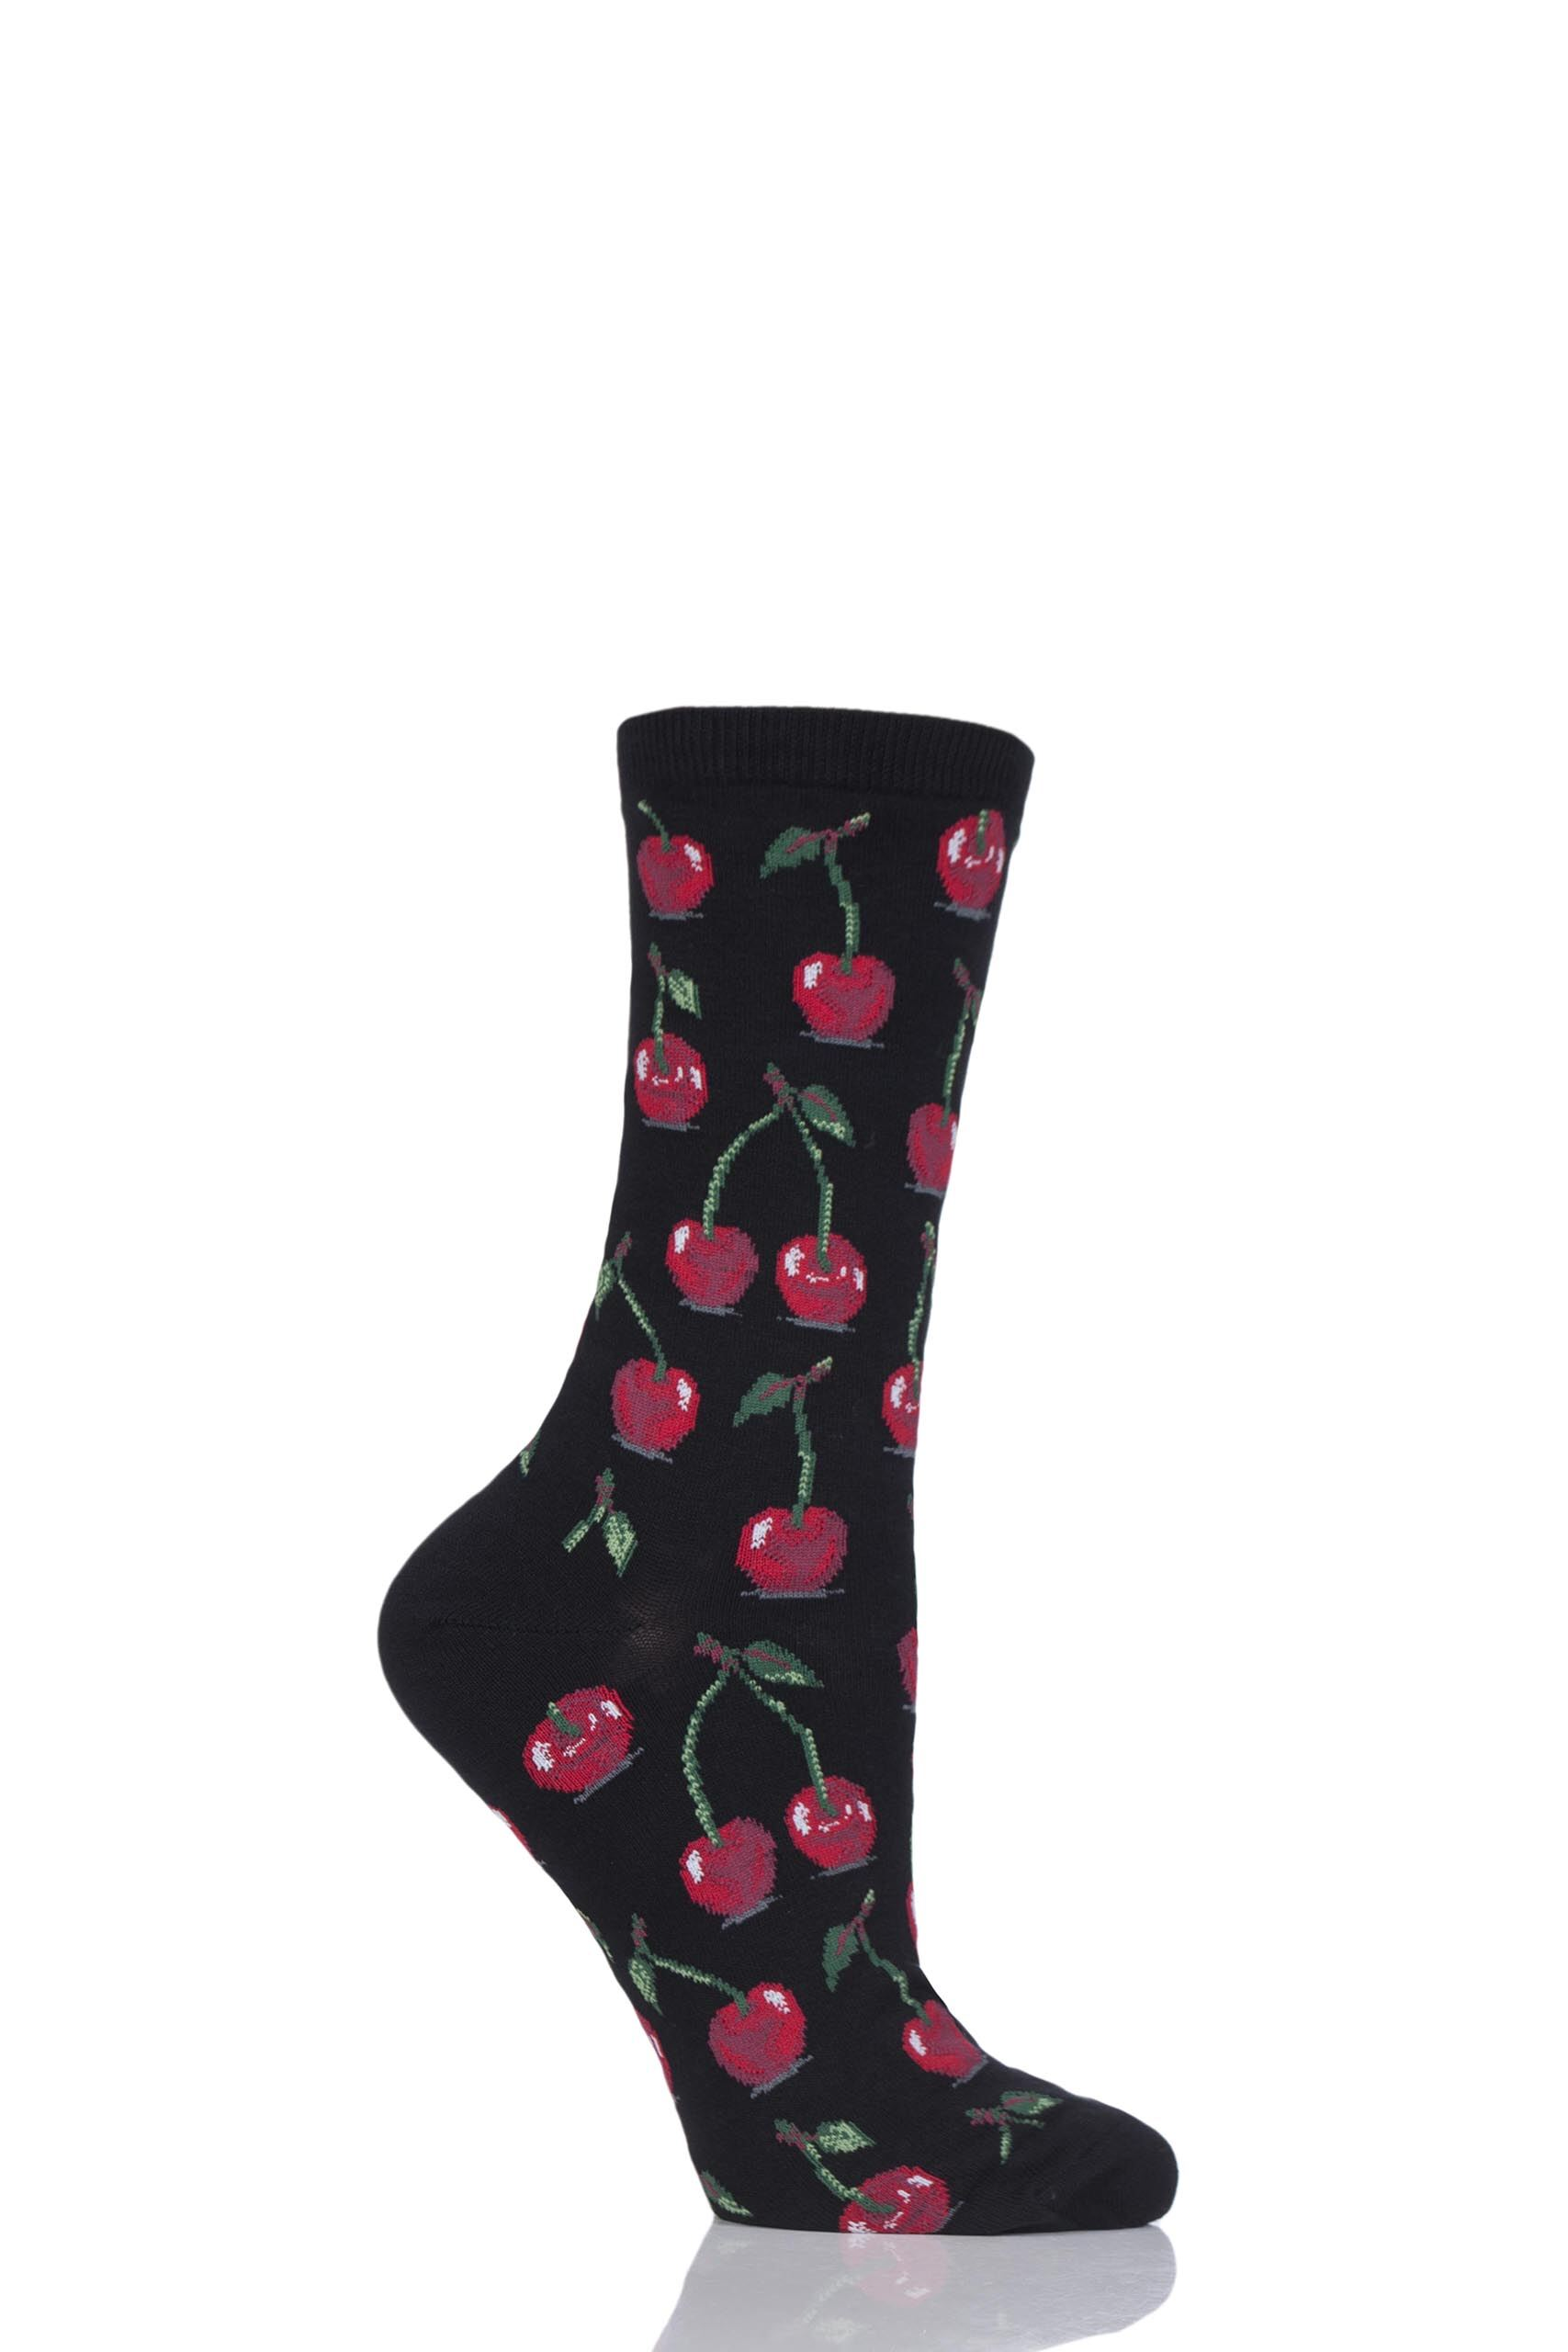 Image of 1 Pair Black HotSox Cherries Cotton Socks Ladies 4-9 Ladies - Hot Sox